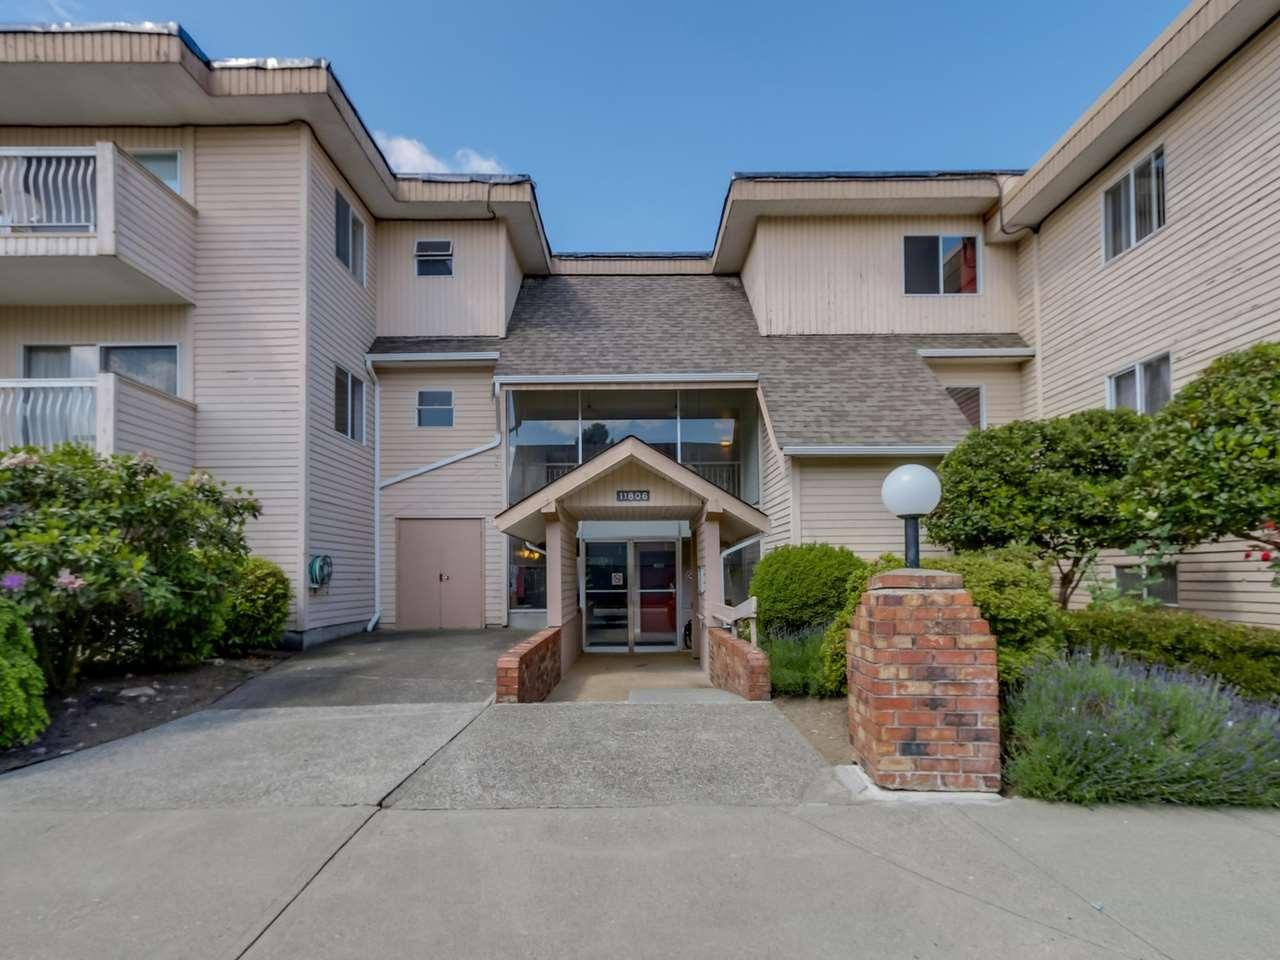 R2075097 - 107 11806 88 AVENUE, Annieville, Delta, BC - Apartment Unit